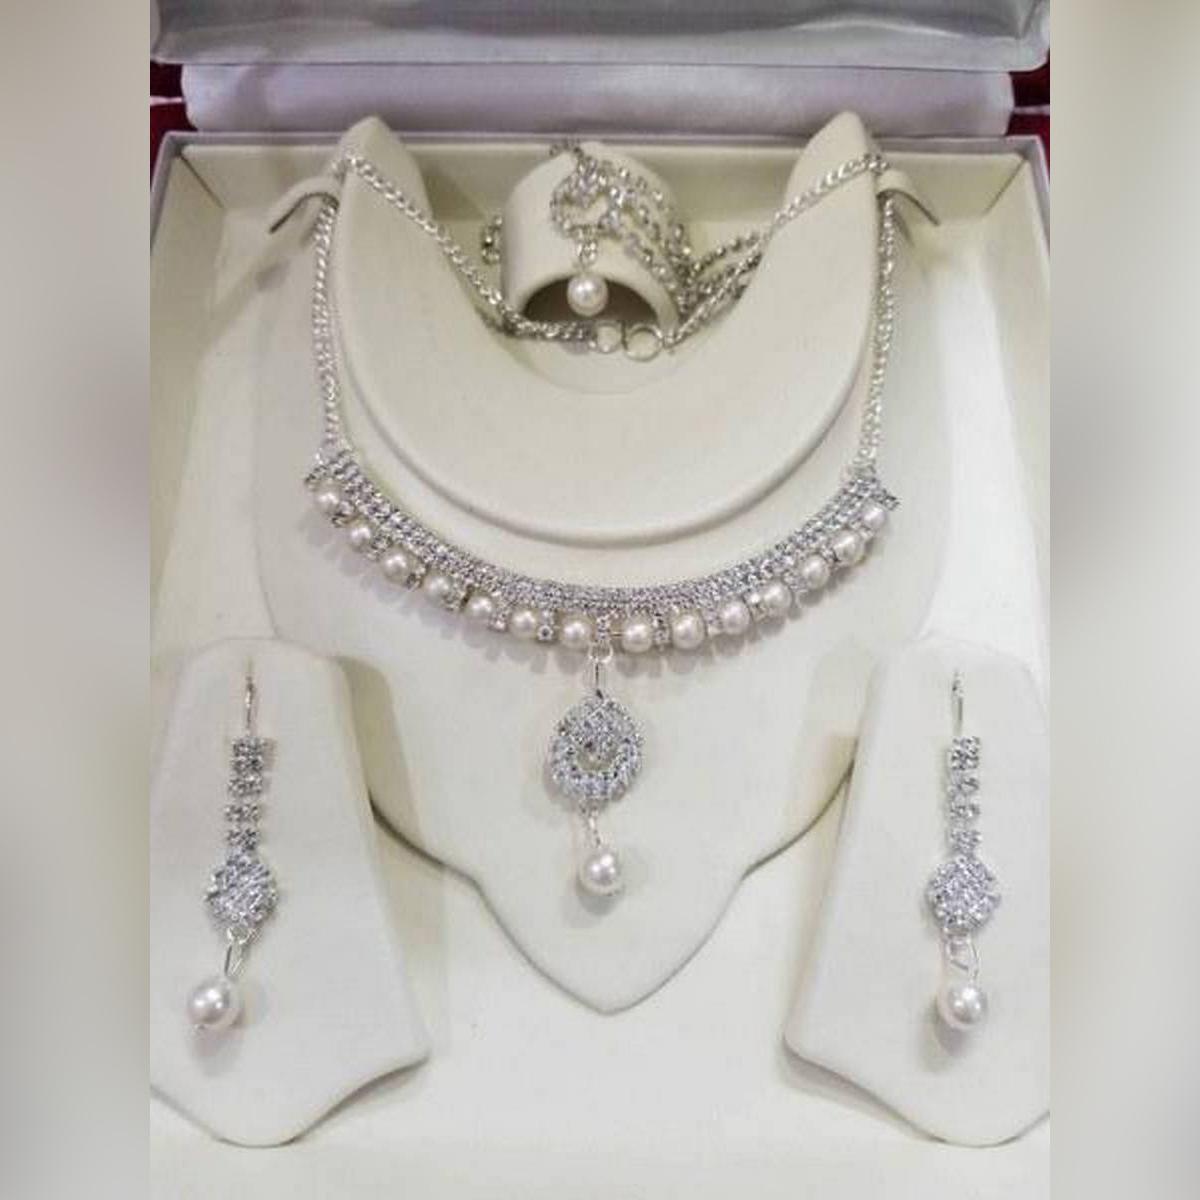 Girls Necklace ,Earrings ,Jewellery Set Silver Crystal Rhinstone Hot Fashion Trendy Style Party Wear, Bridal Wear , Fashion For Women